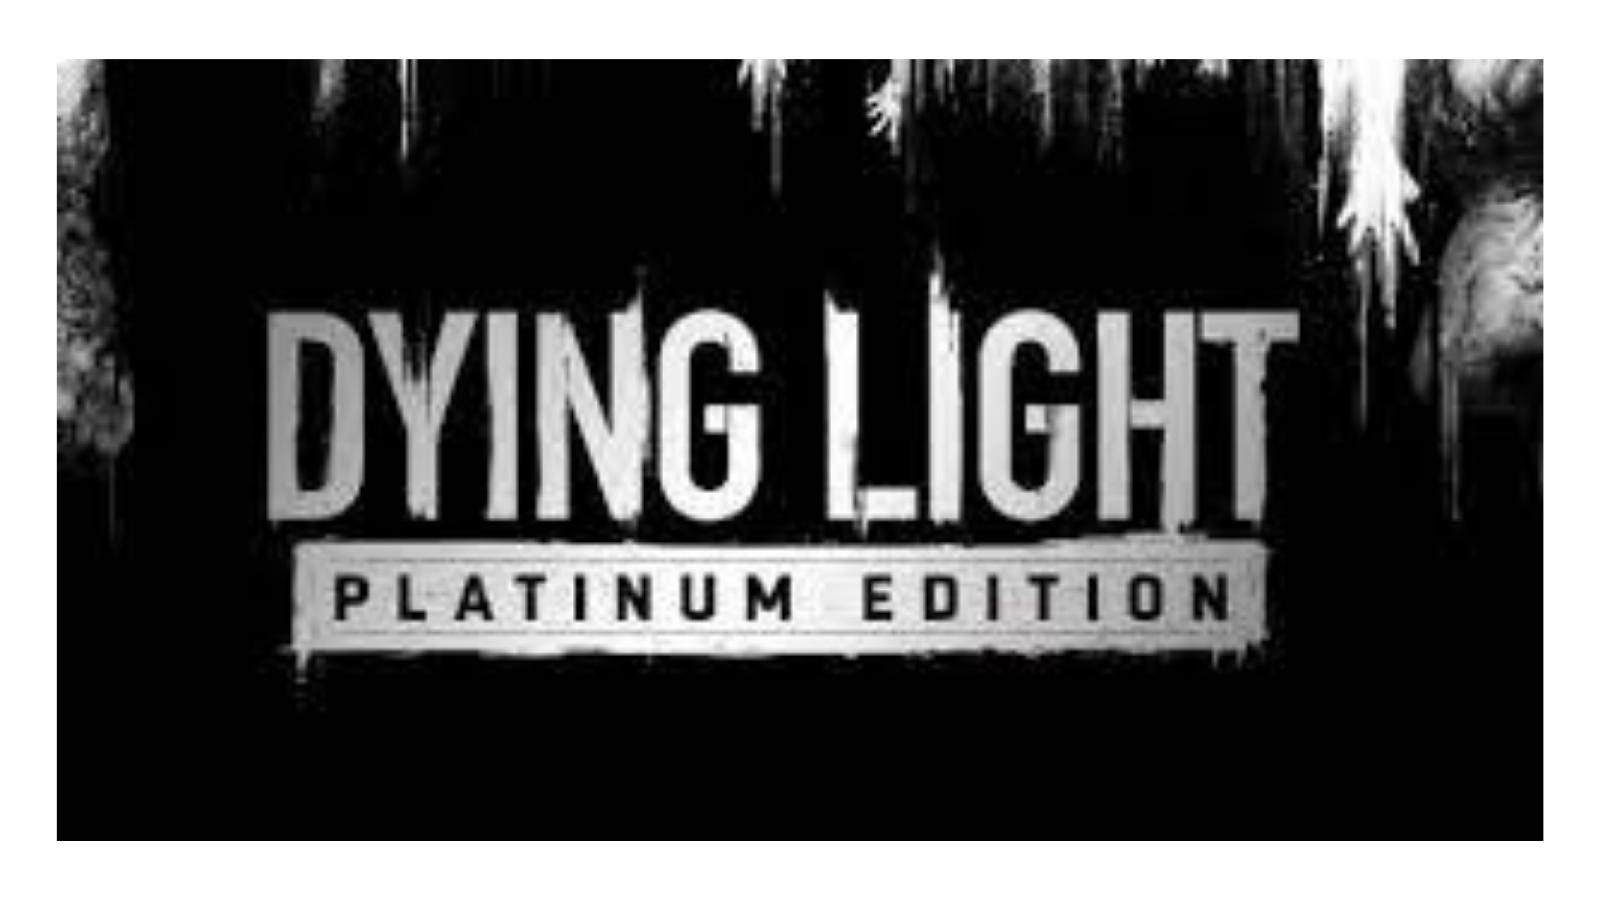 dying light platinum